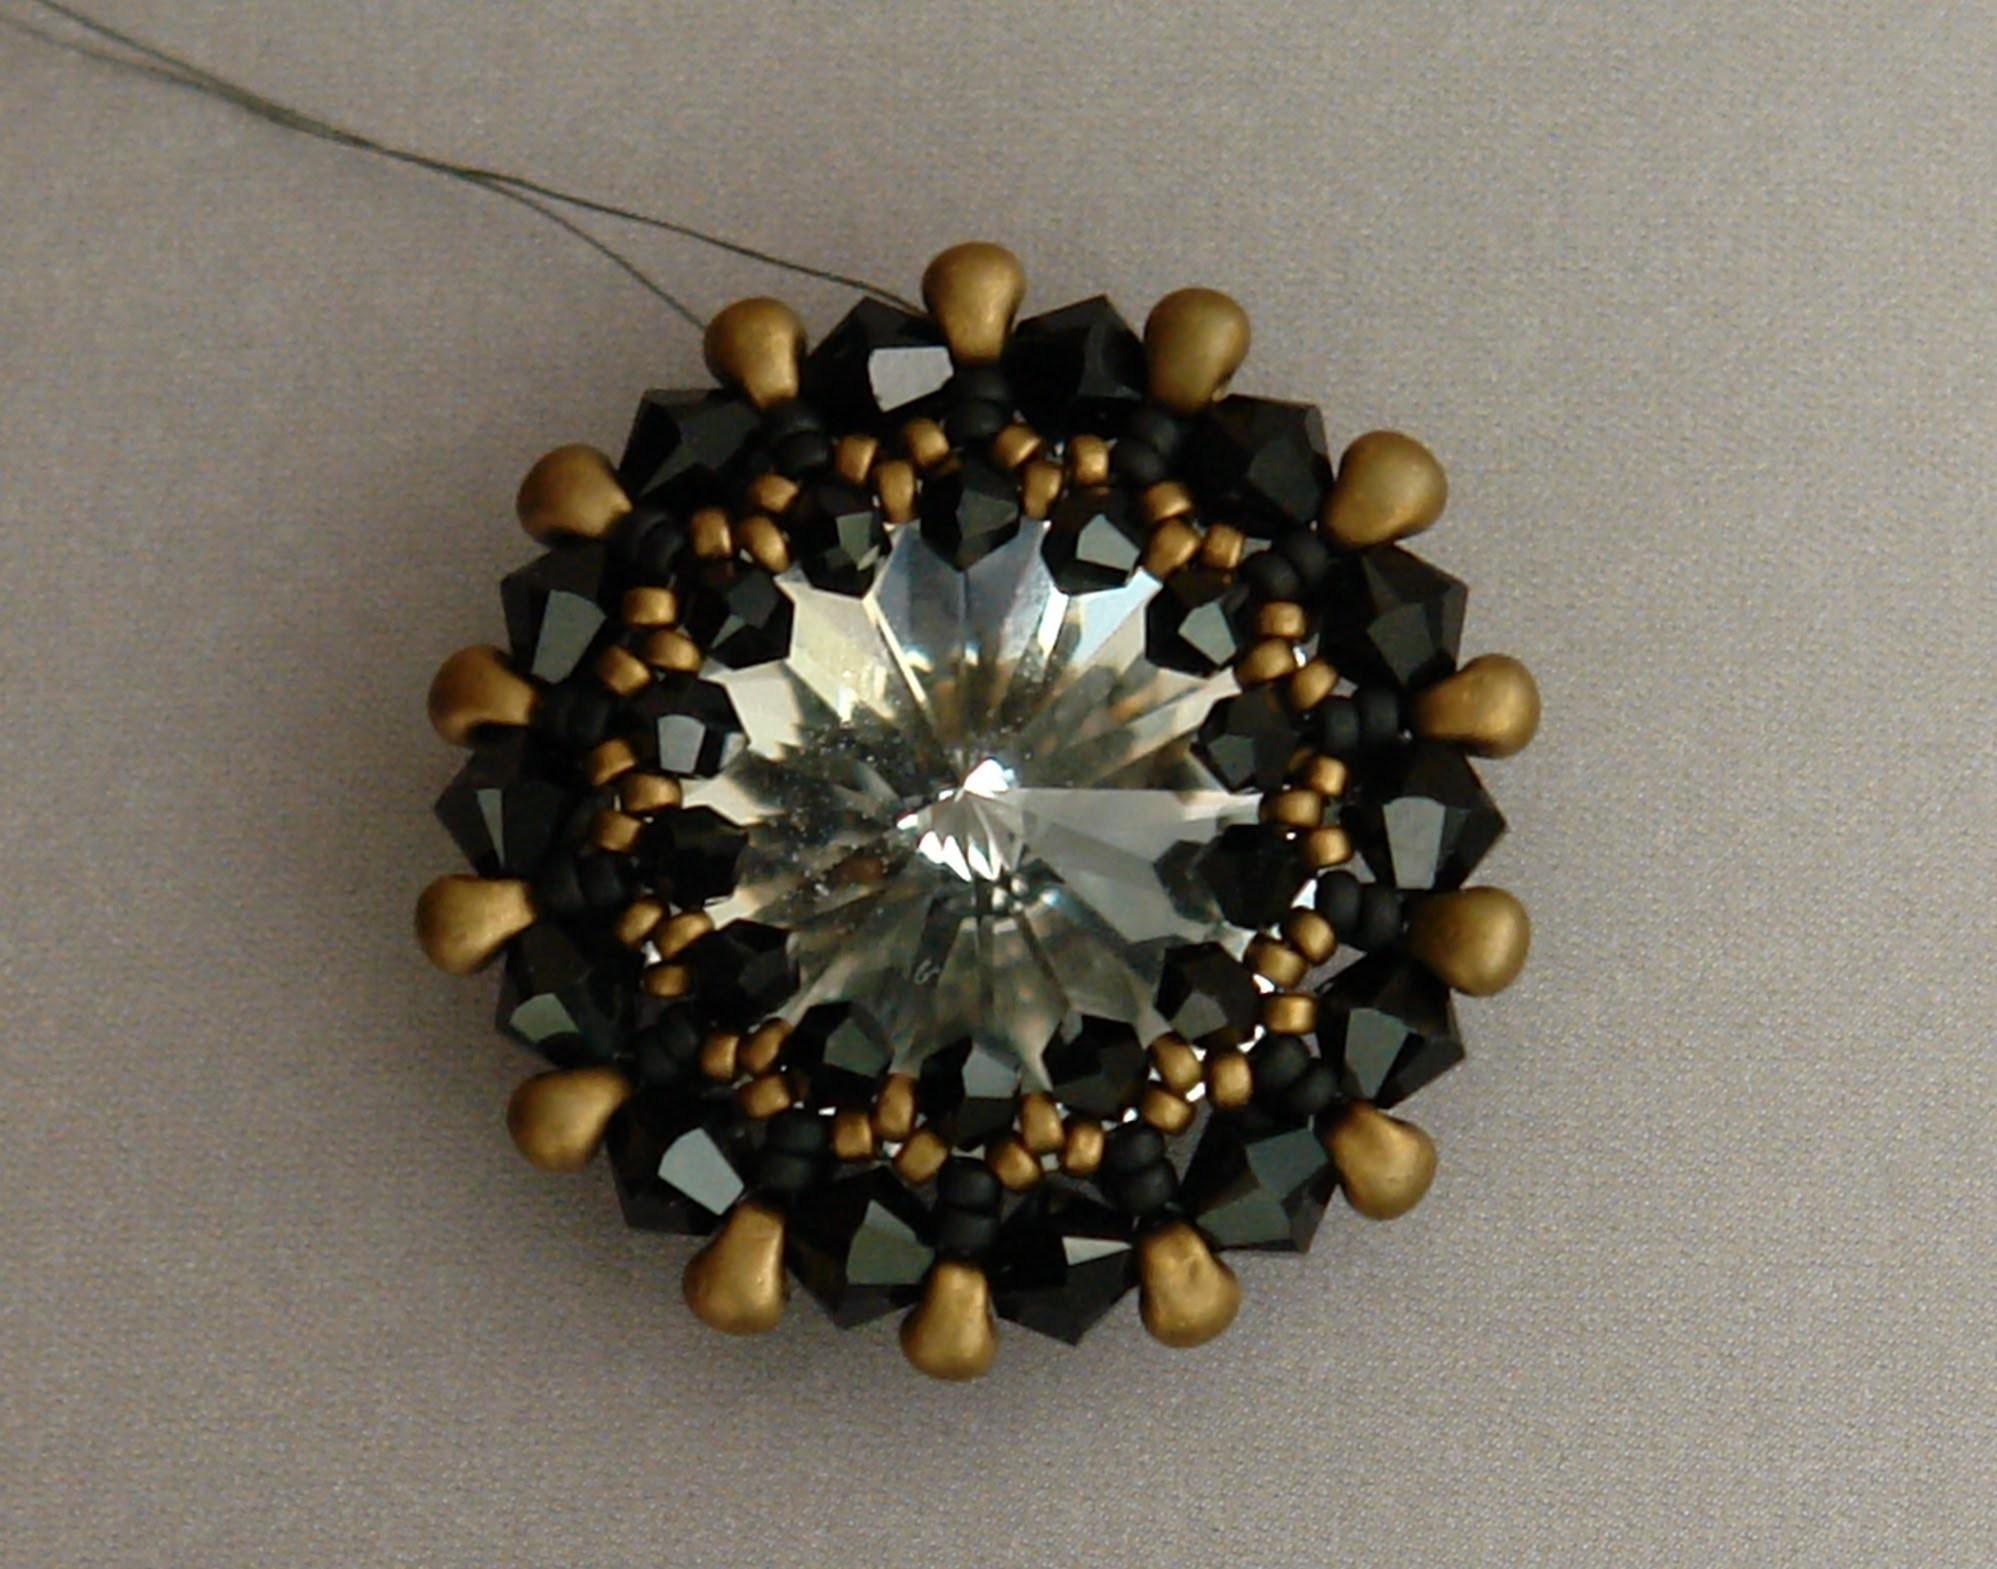 Sidonia's handmade jewelry - How to bezel an 18mm Swarovski rivoli